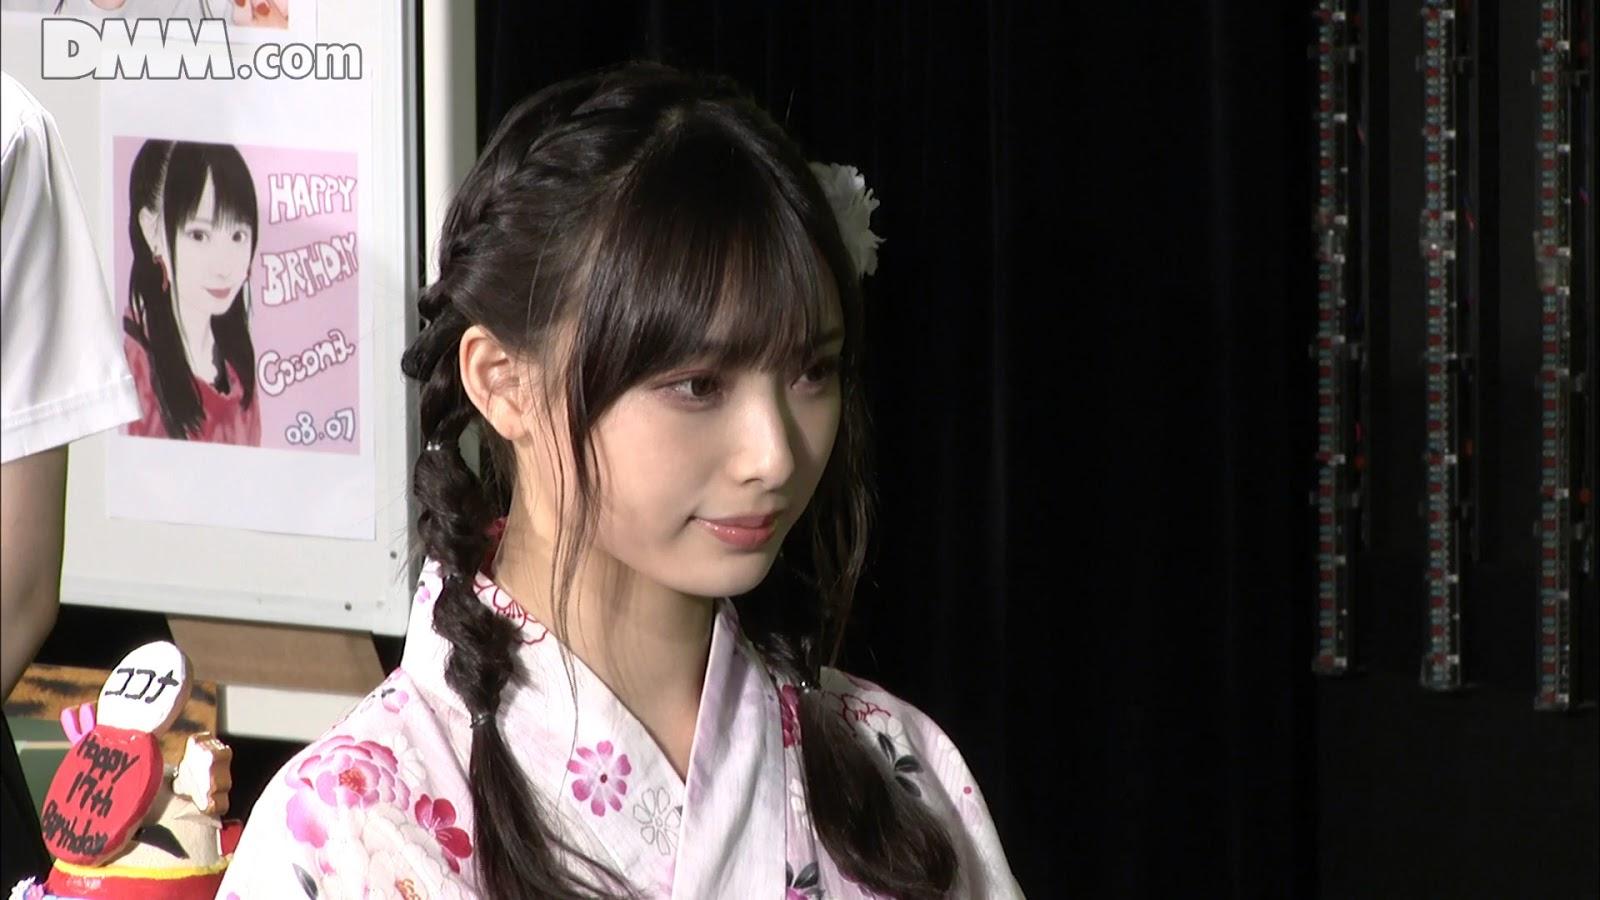 NMB48 Umeyama Cocona Birthday 200808 LOD 1800 DMM